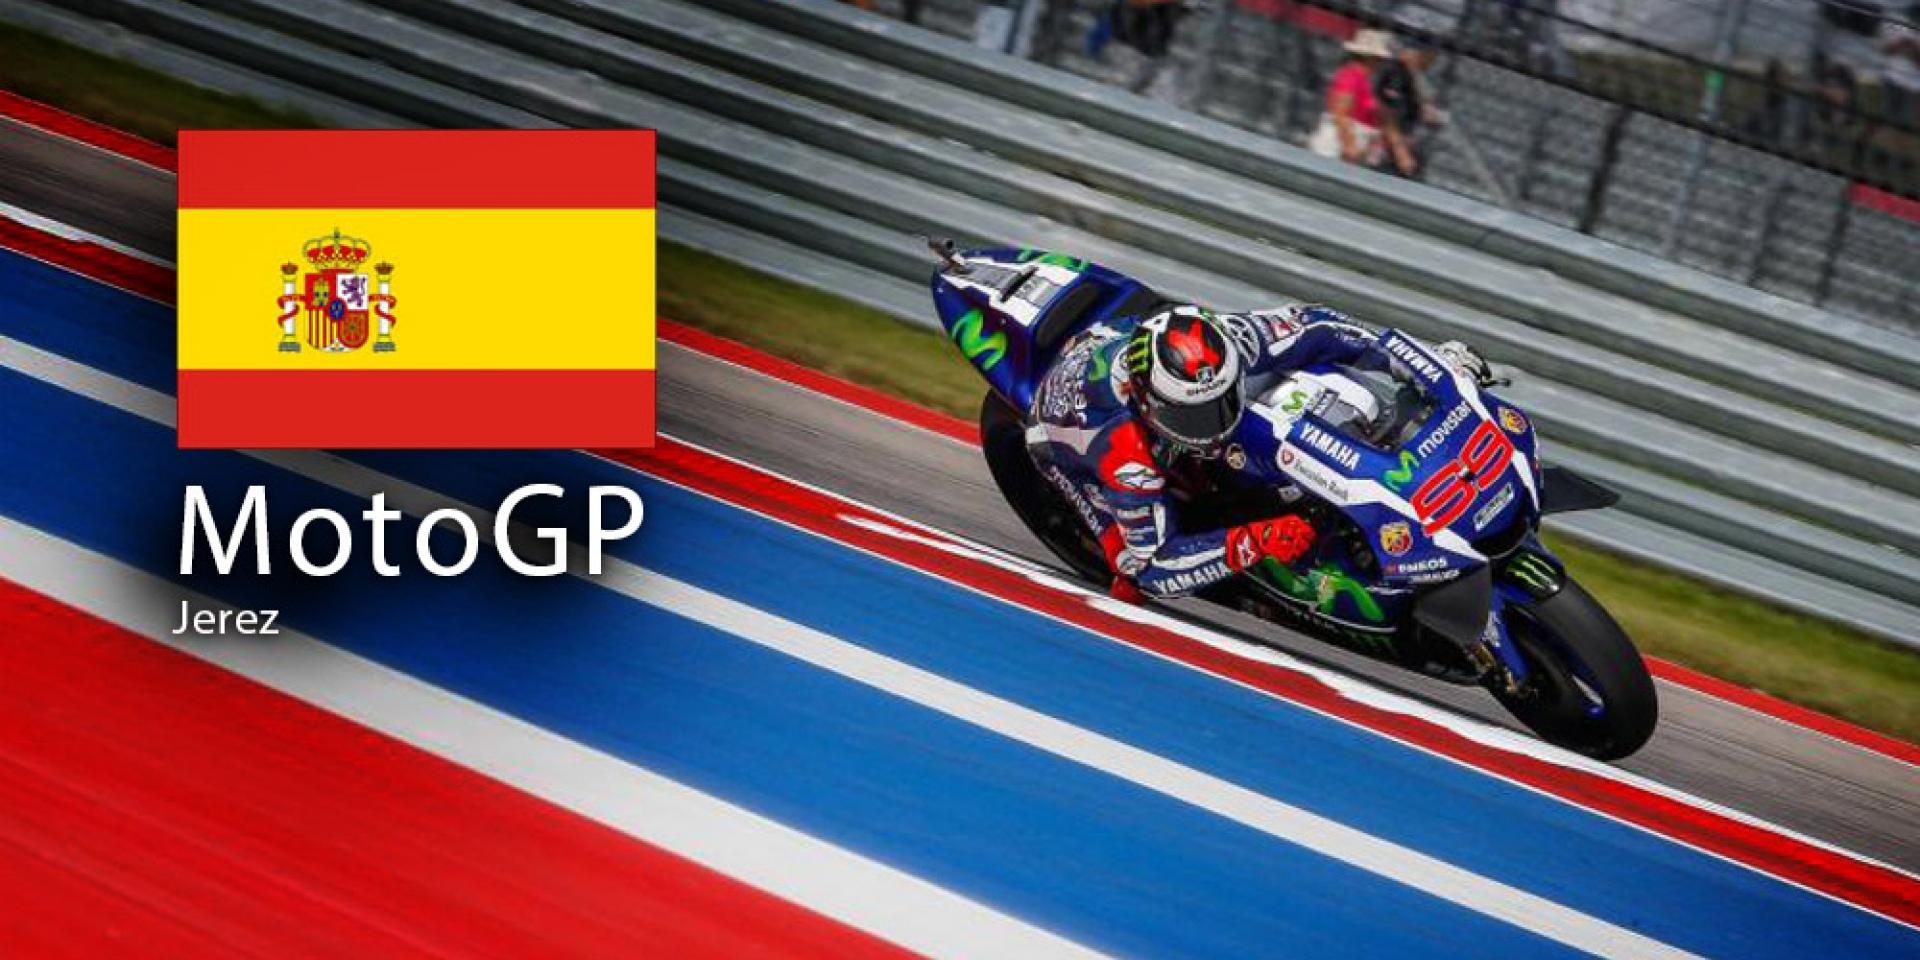 MotoGP 第4站 西班牙Jerez 轉播時間